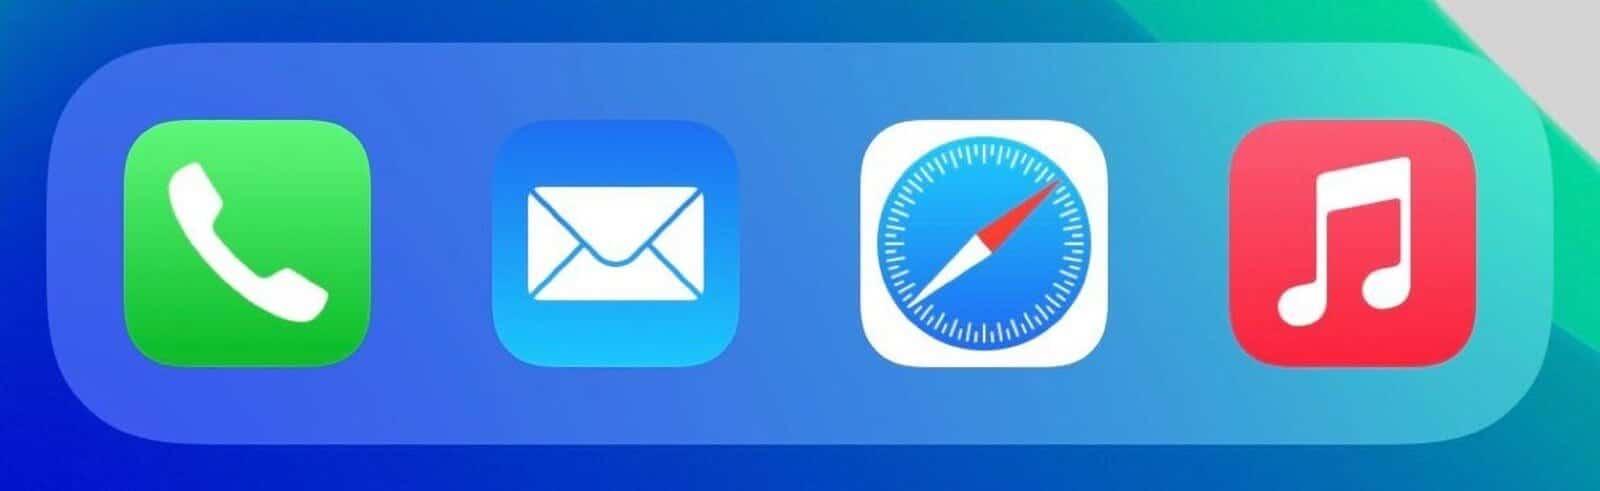 Neues Musik-Icon unter iOS 14 Beta 3 - MacRumors